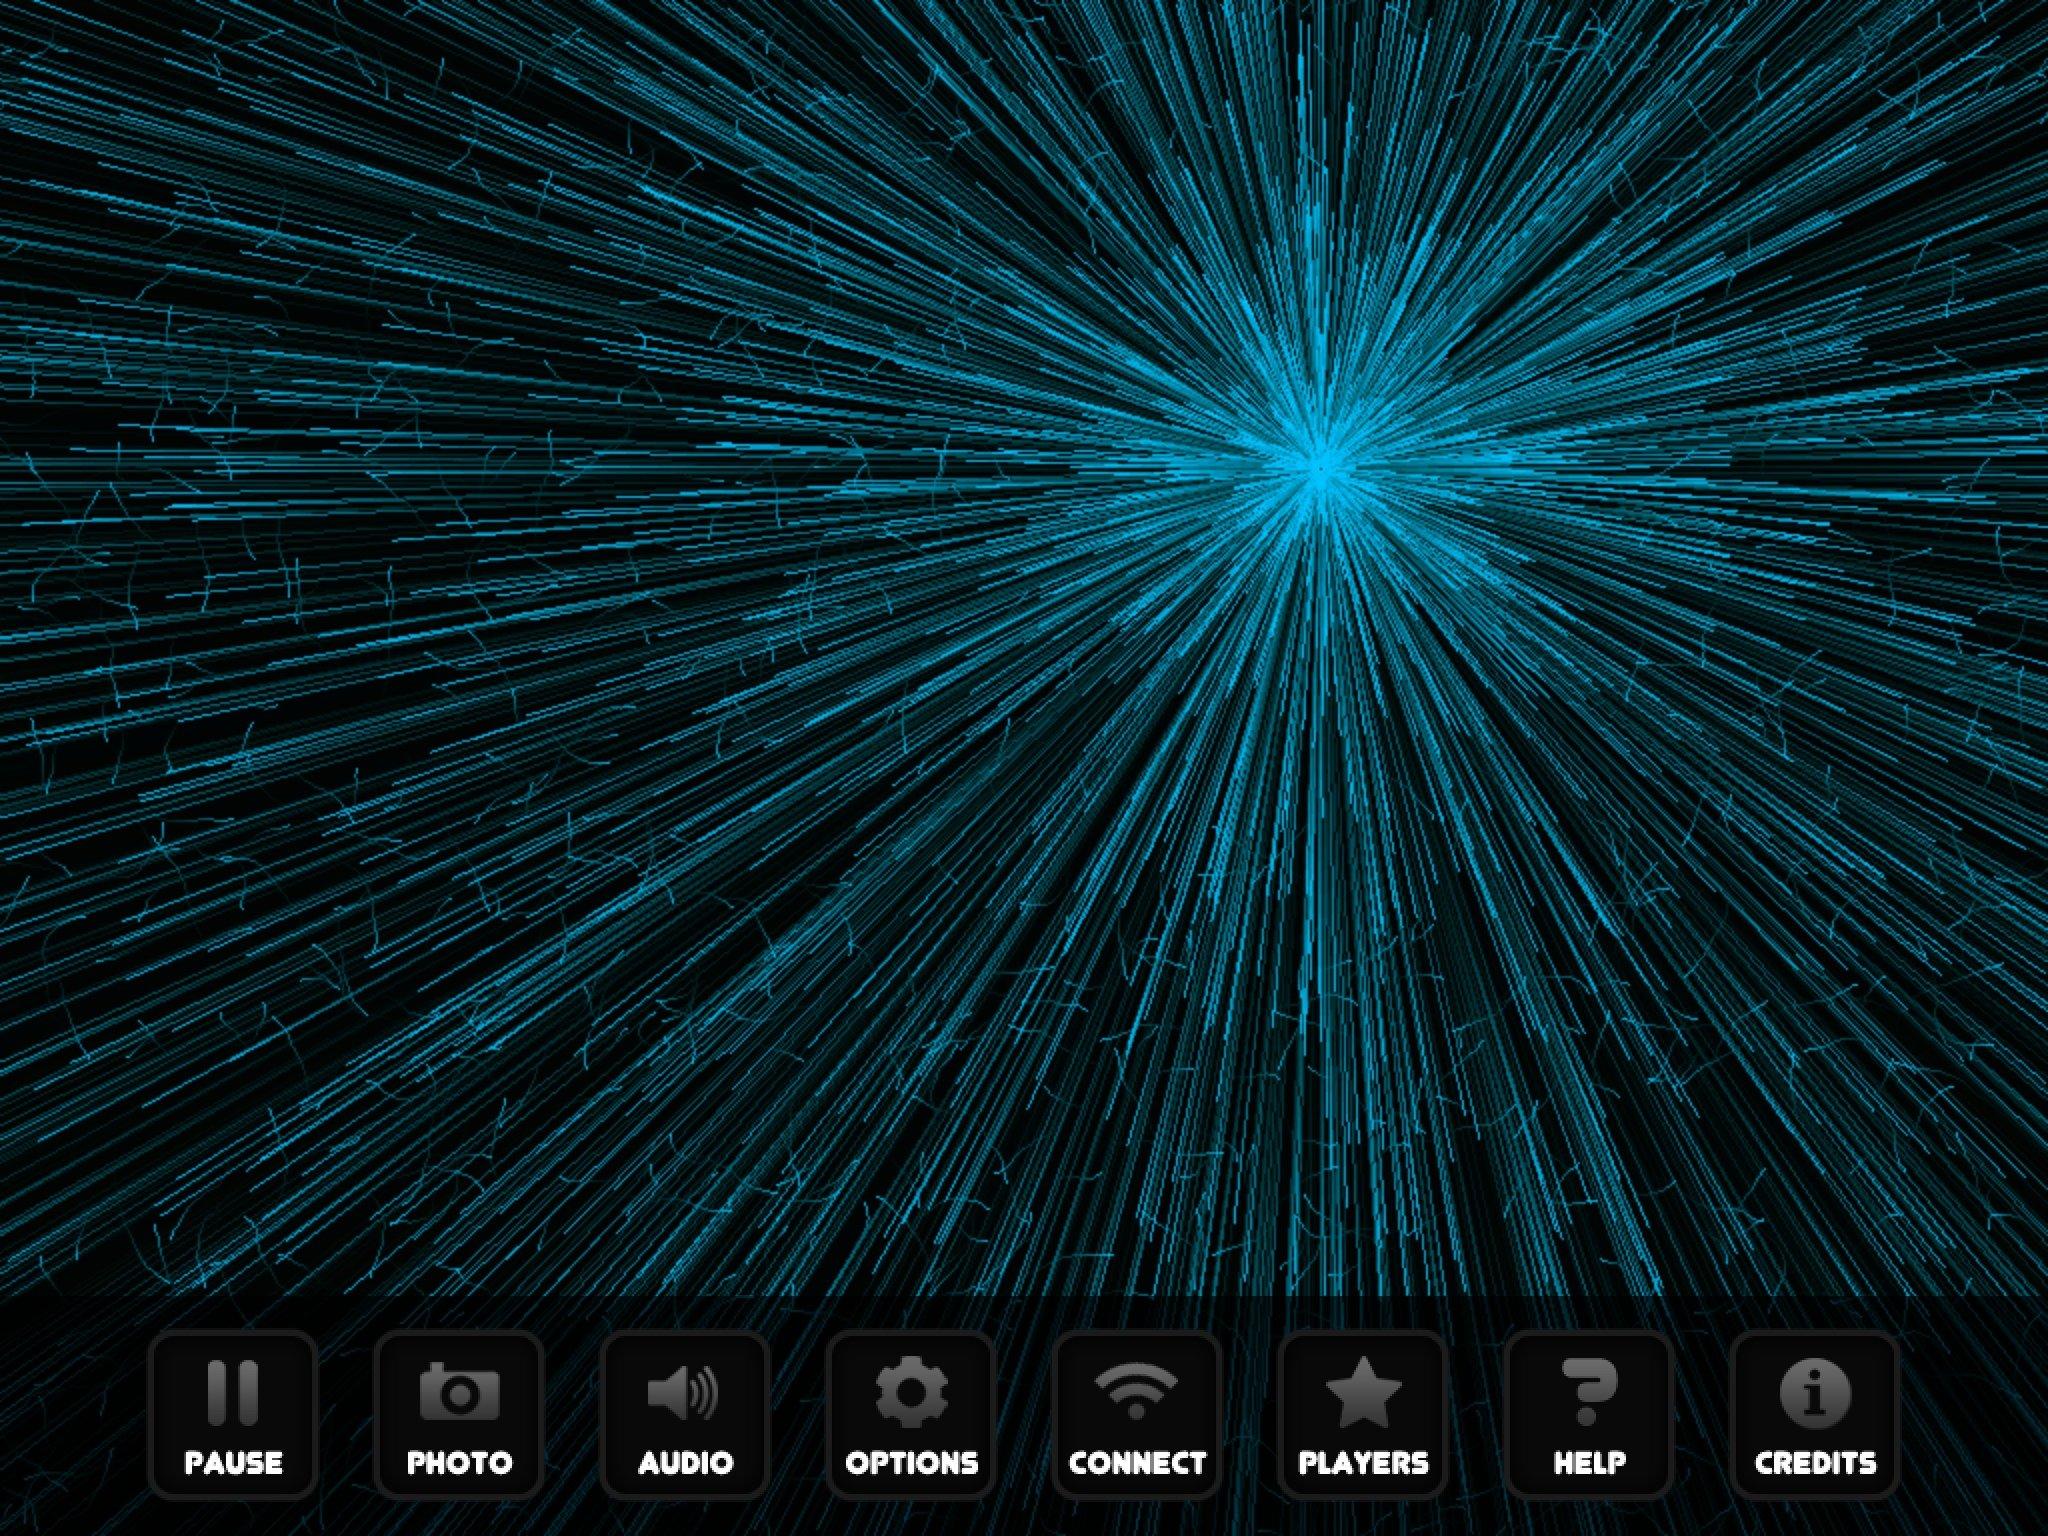 Particle Physics Wallpaper WallpaperSafari